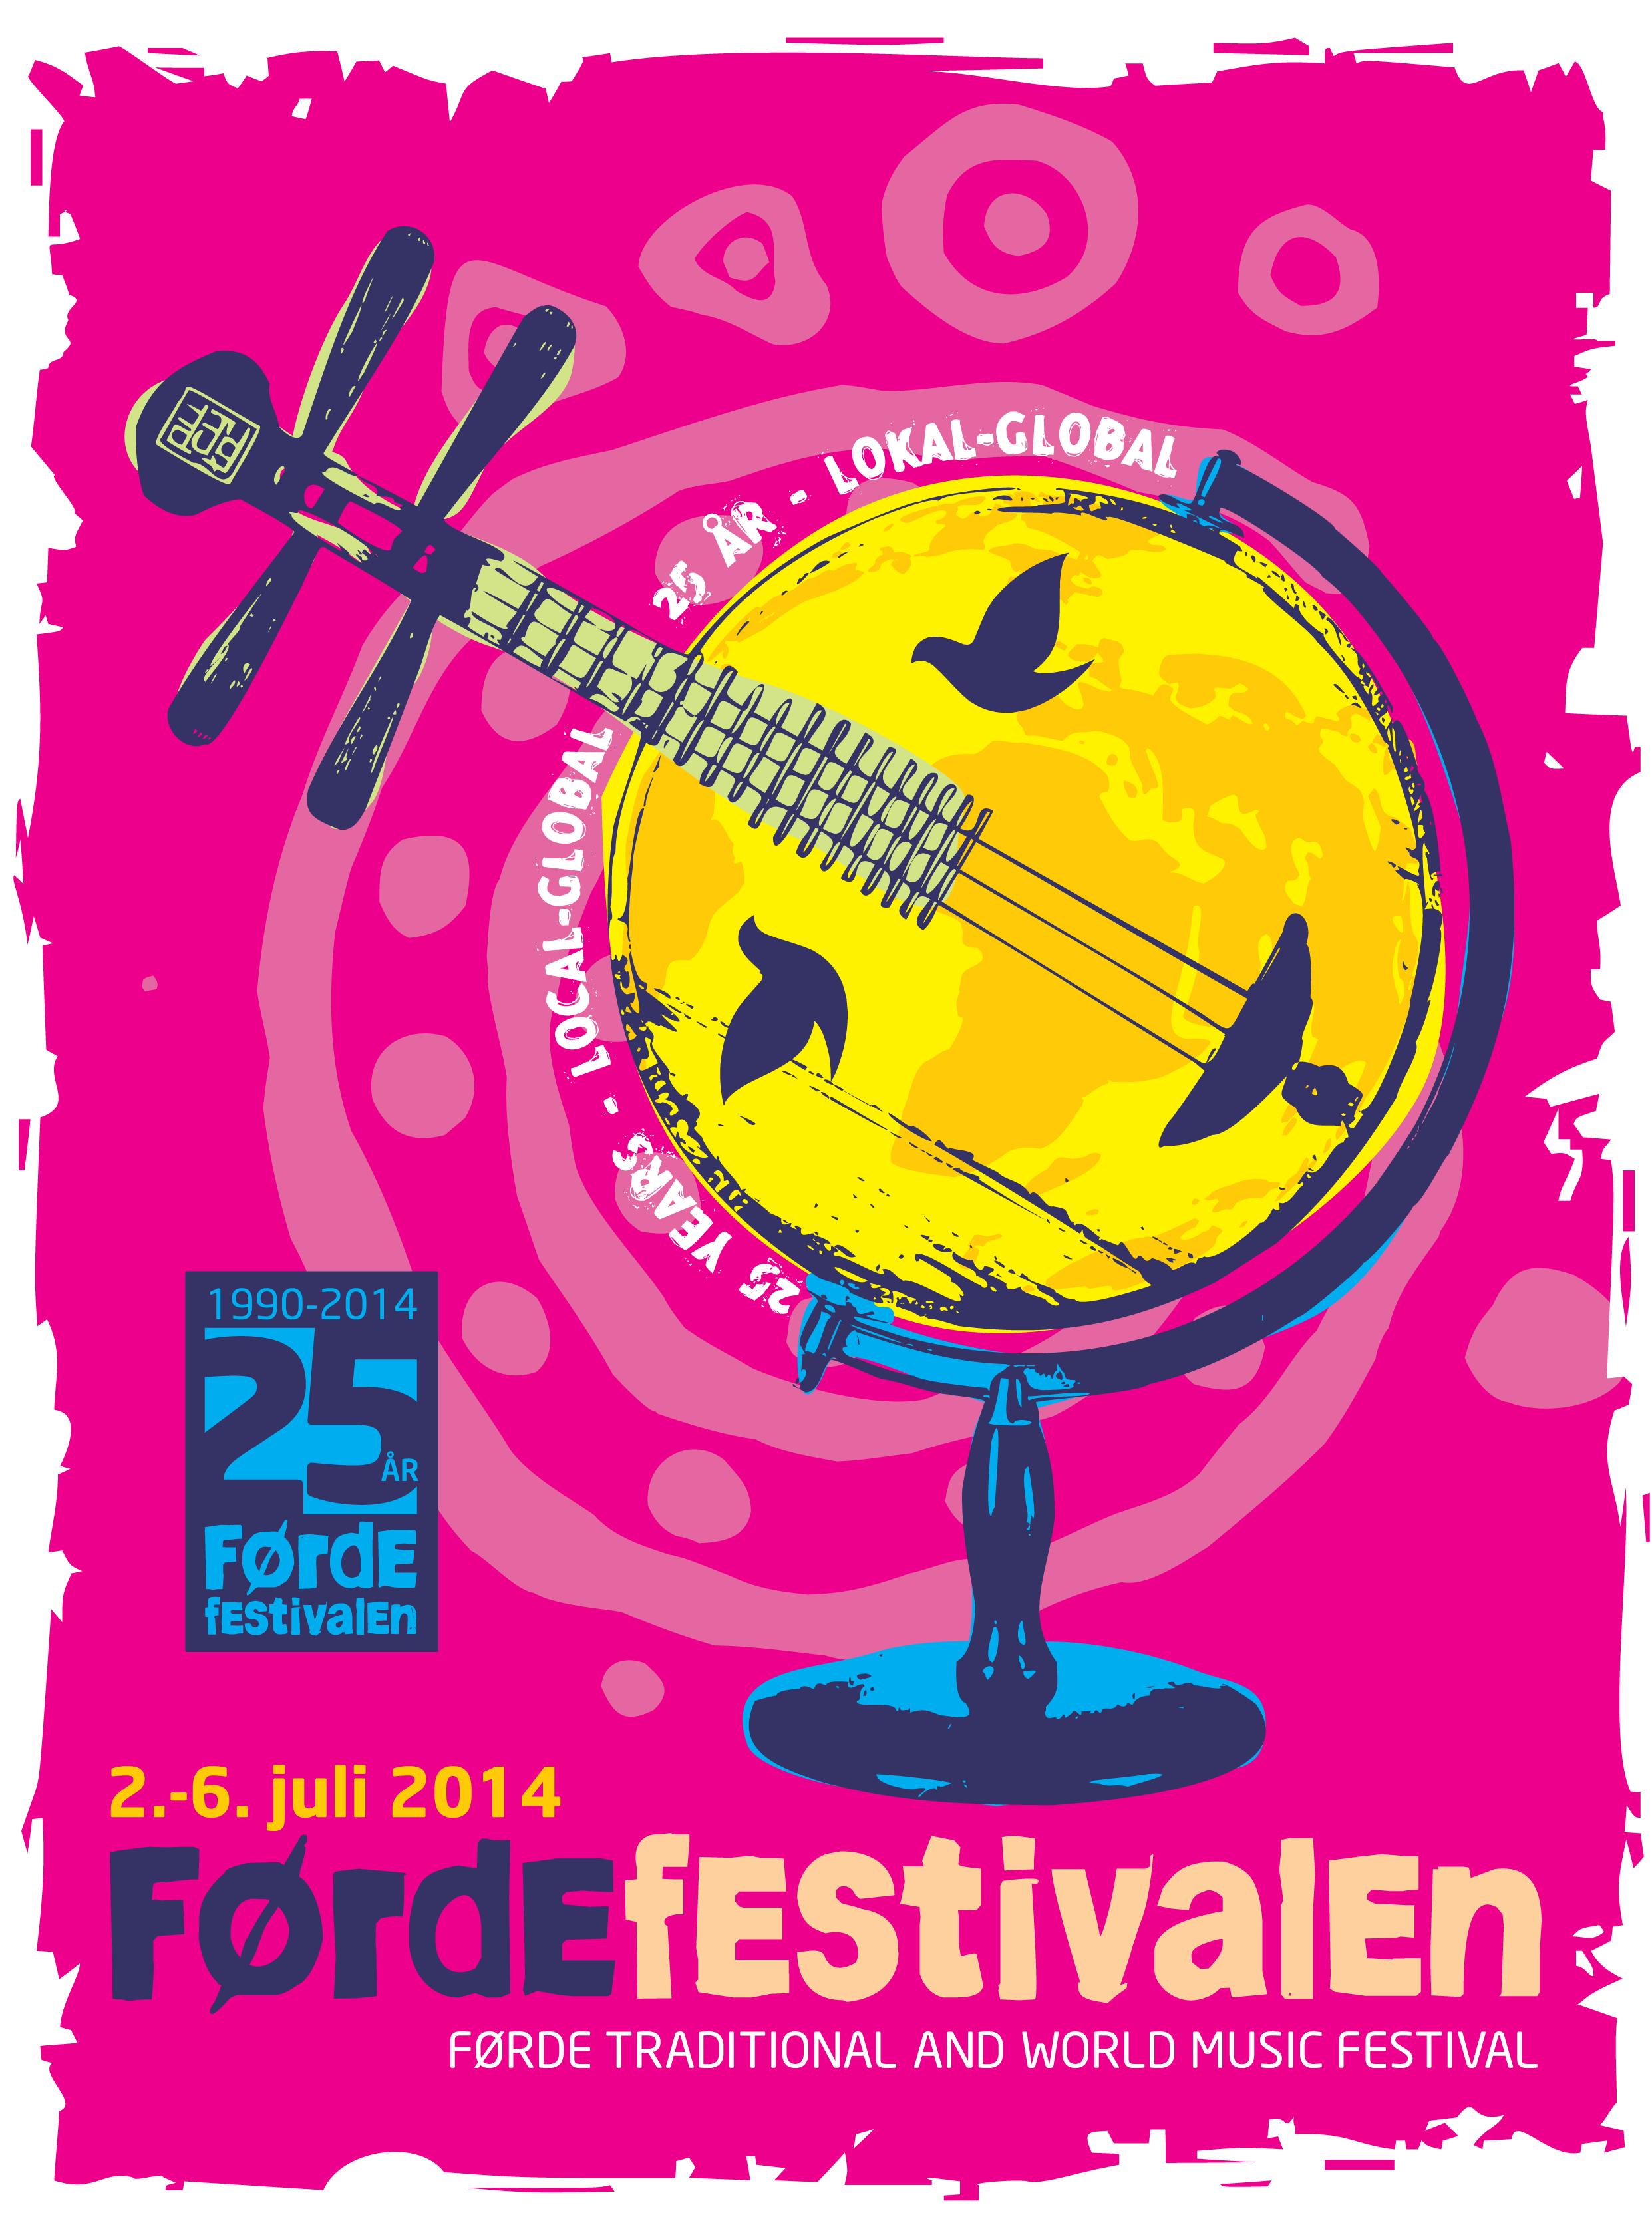 Førdefestivalen-poster_2014.png